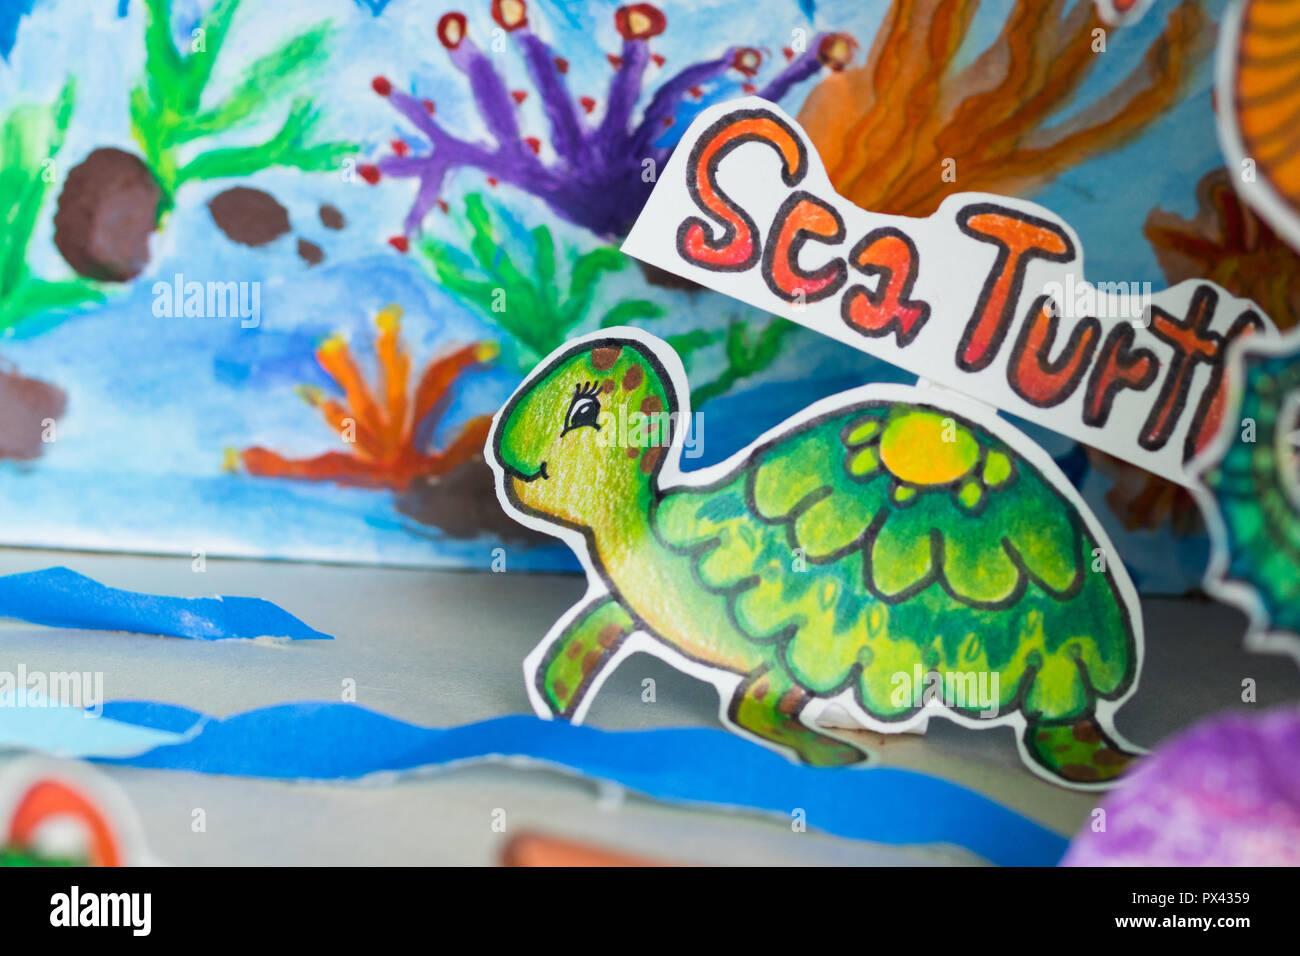 paper art sea turtle - Stock Image